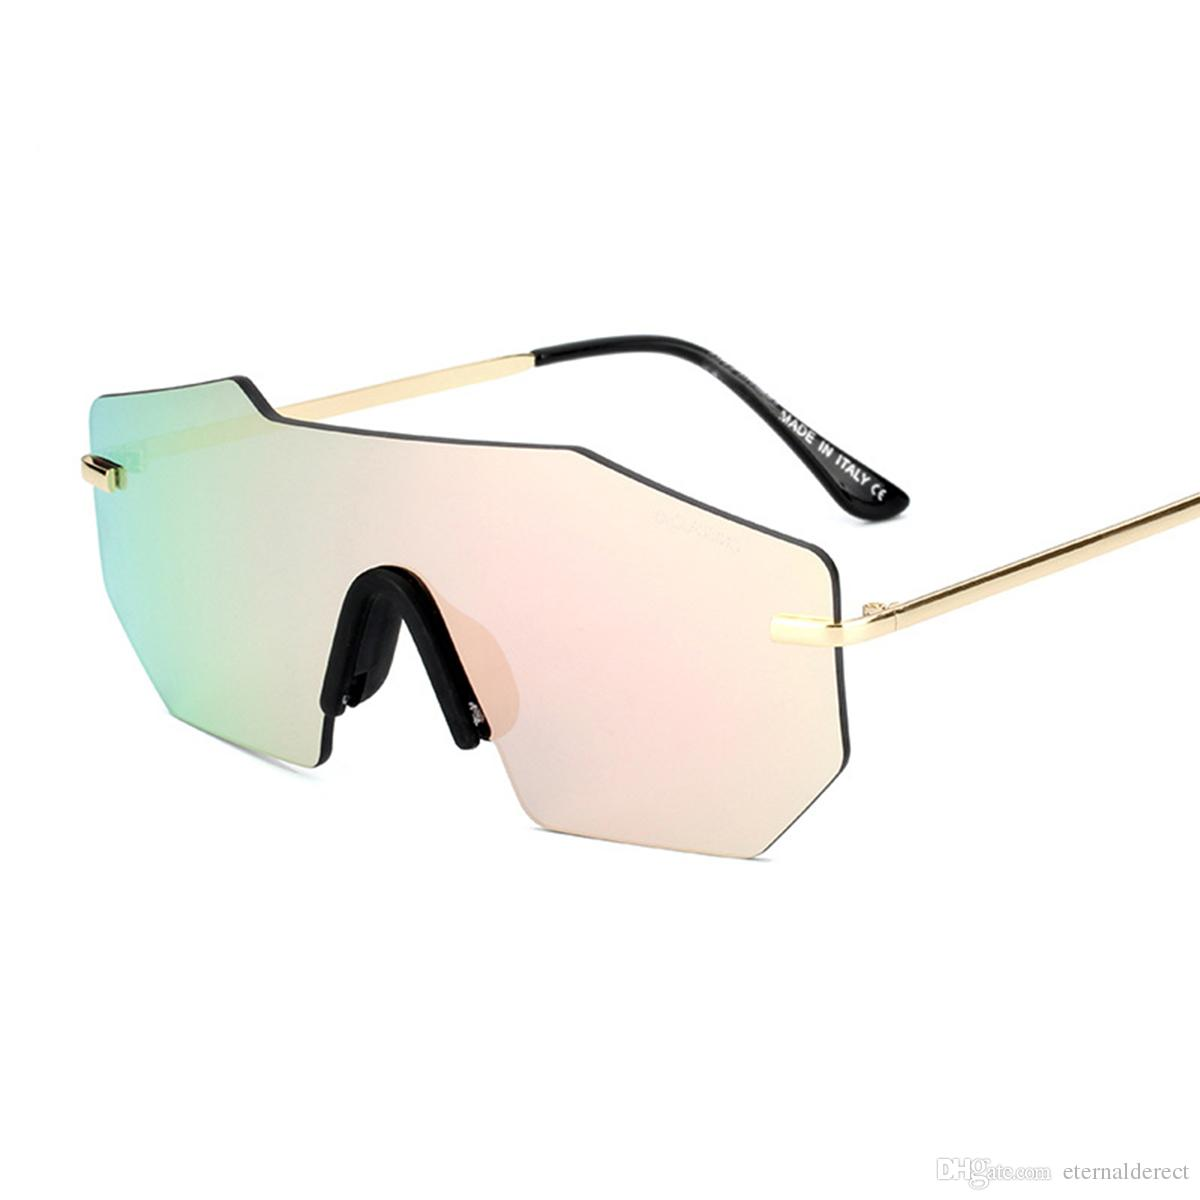 986ba22b58 Summer Newest Style Only SUN Glasses Sunglasses Men Bicycle Glass NICE  Sports Sunglasses Dazzle Colour Glasses A+++ Prescription Glasses Online  Round ...